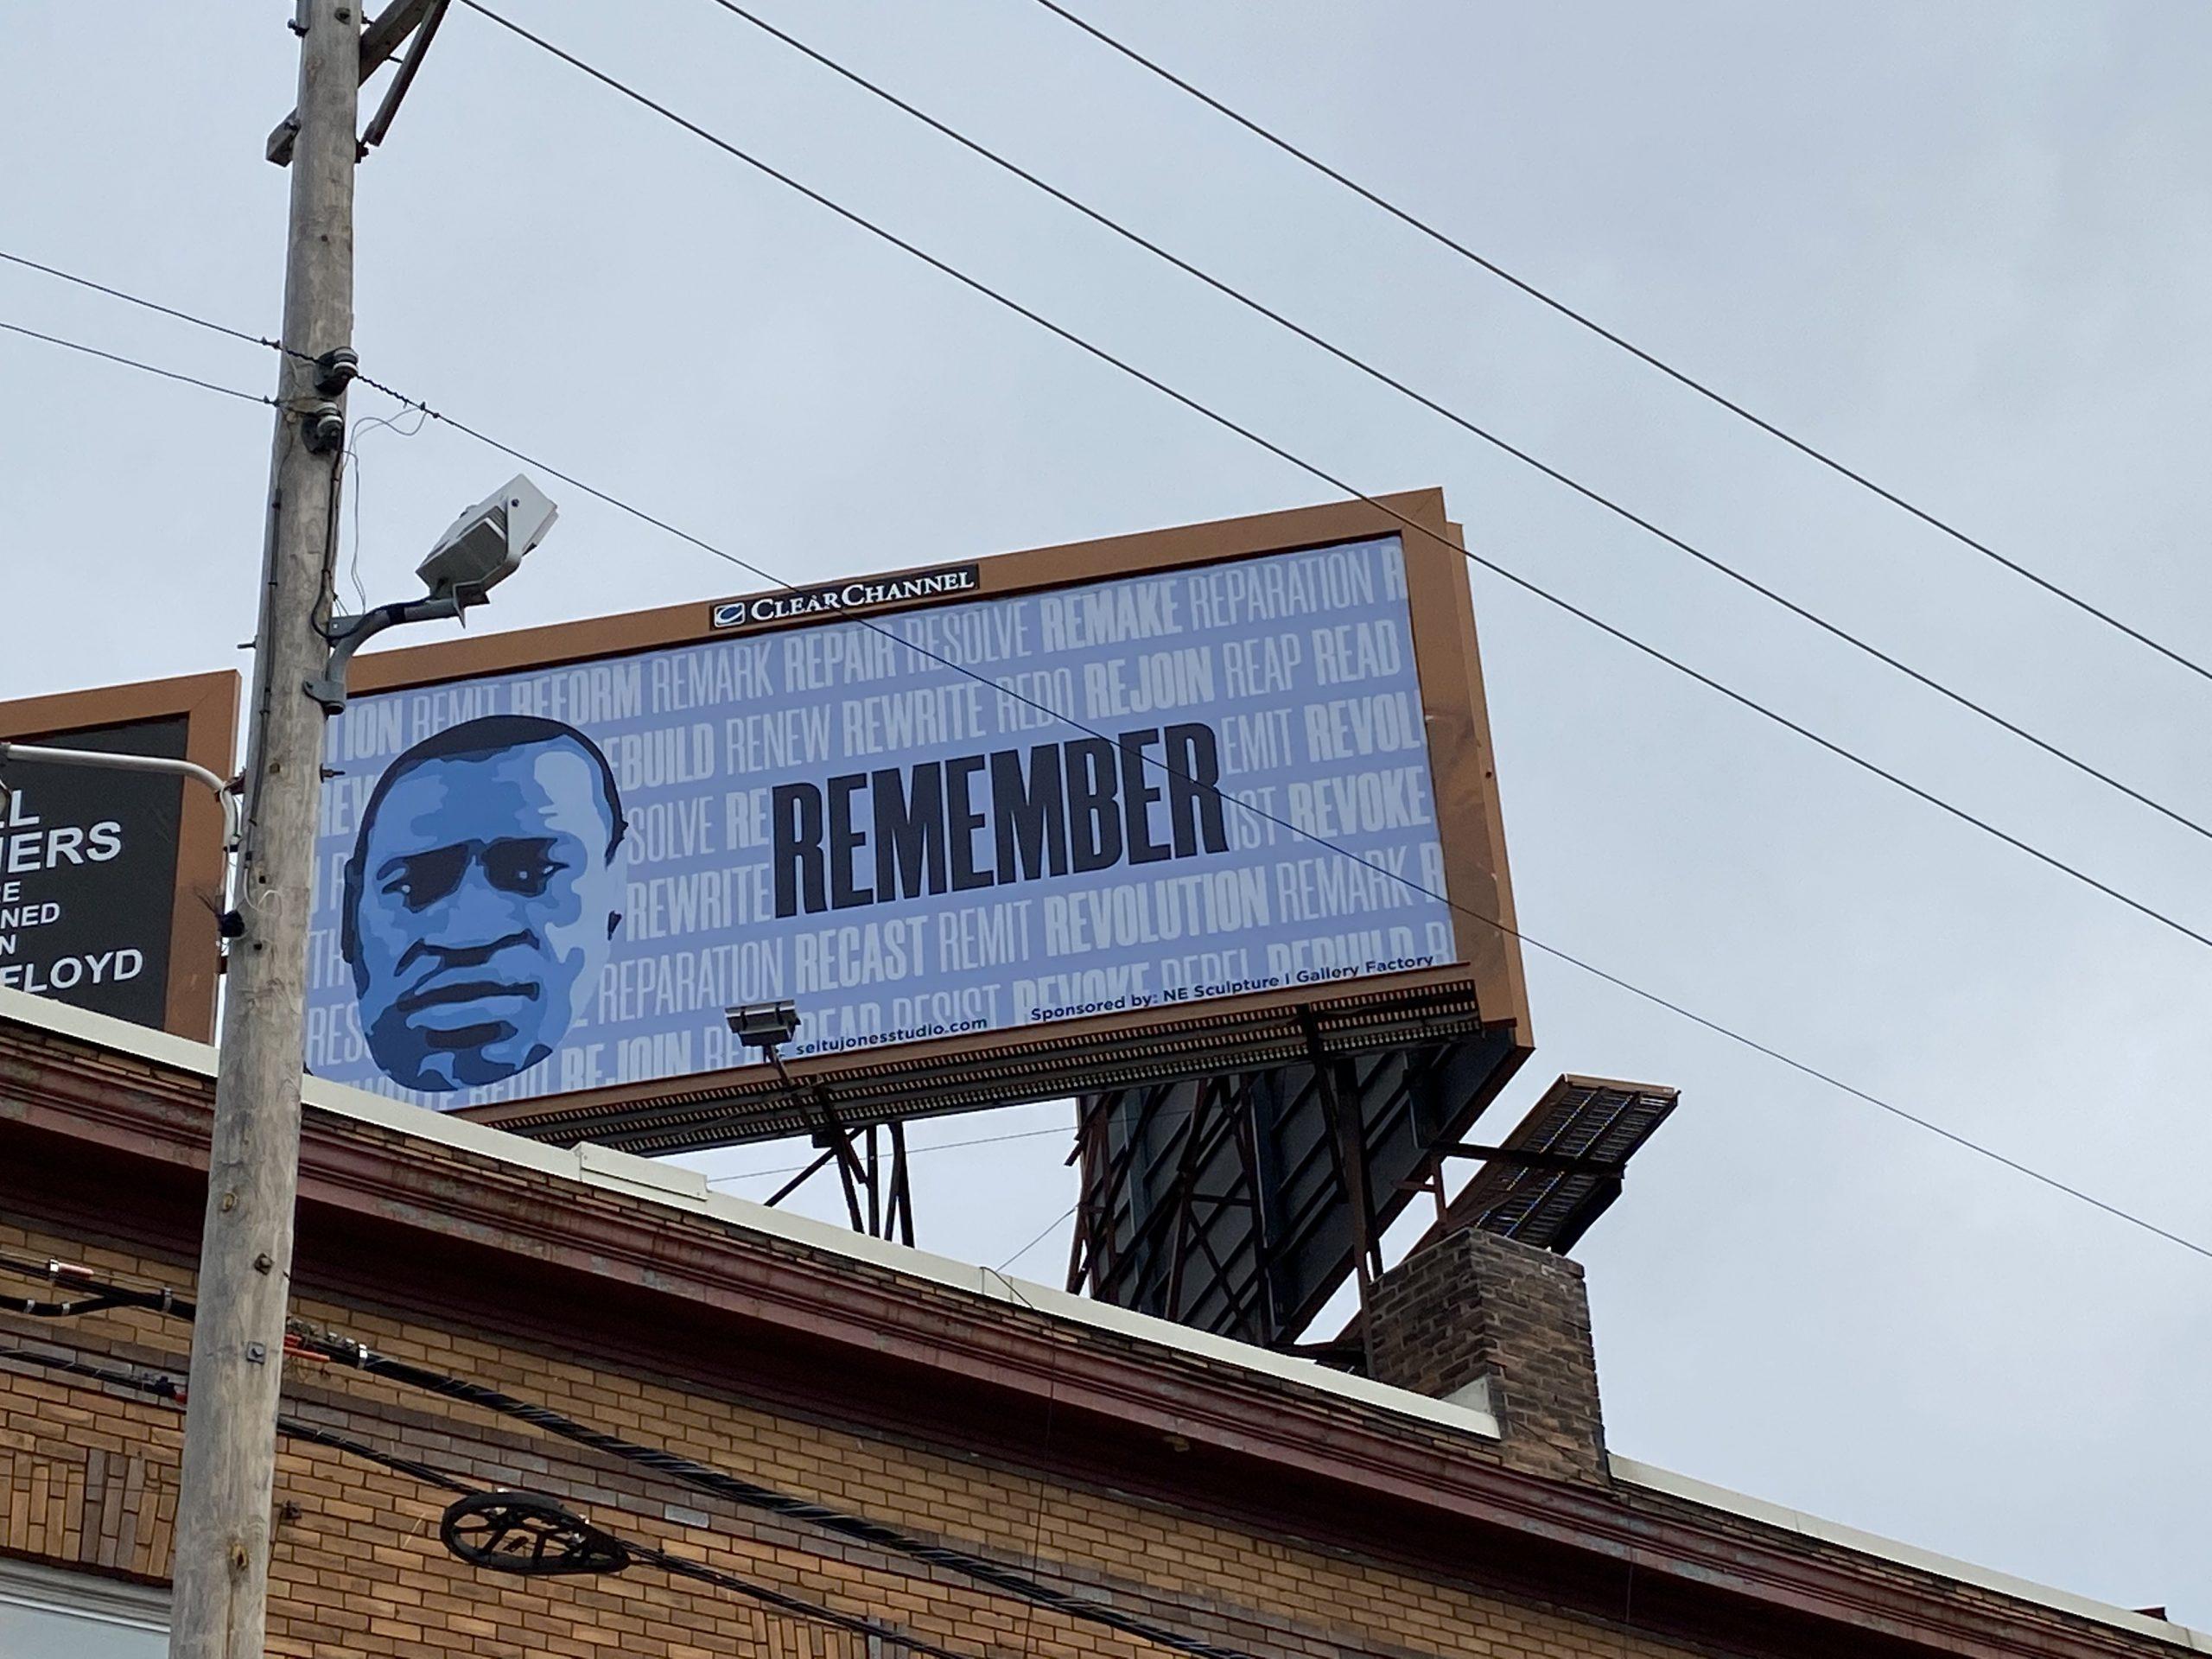 #blues4george billboard by Seitu Jones